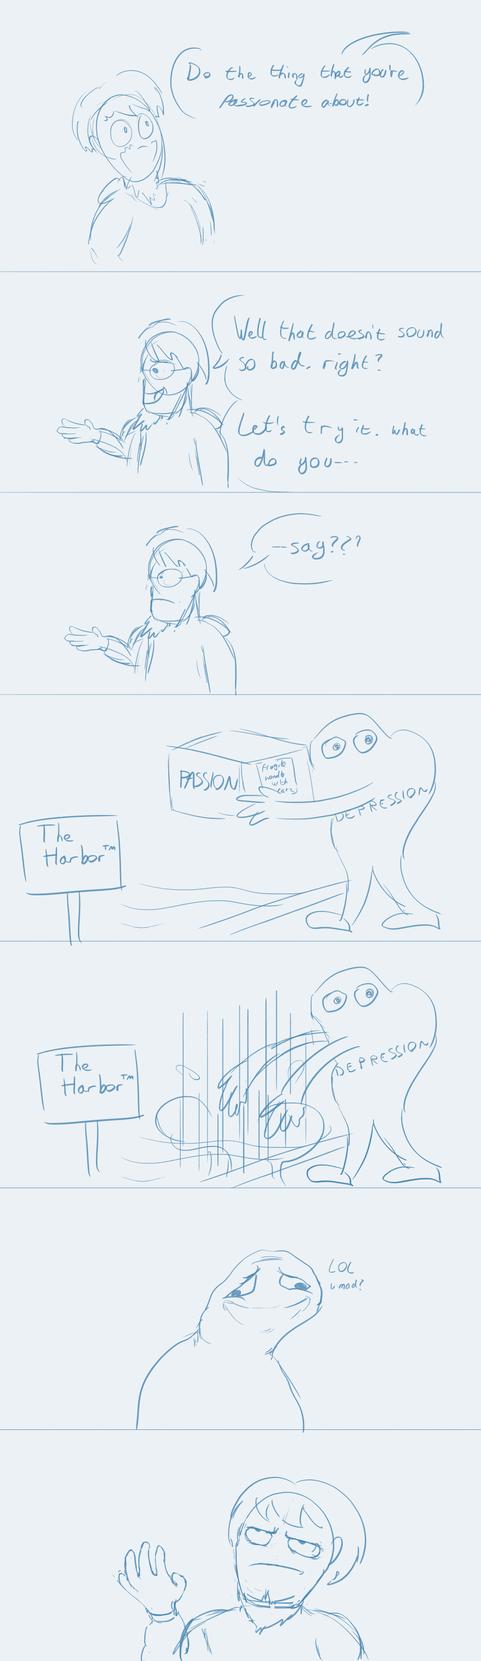 Comic Muh Passion by baratus93